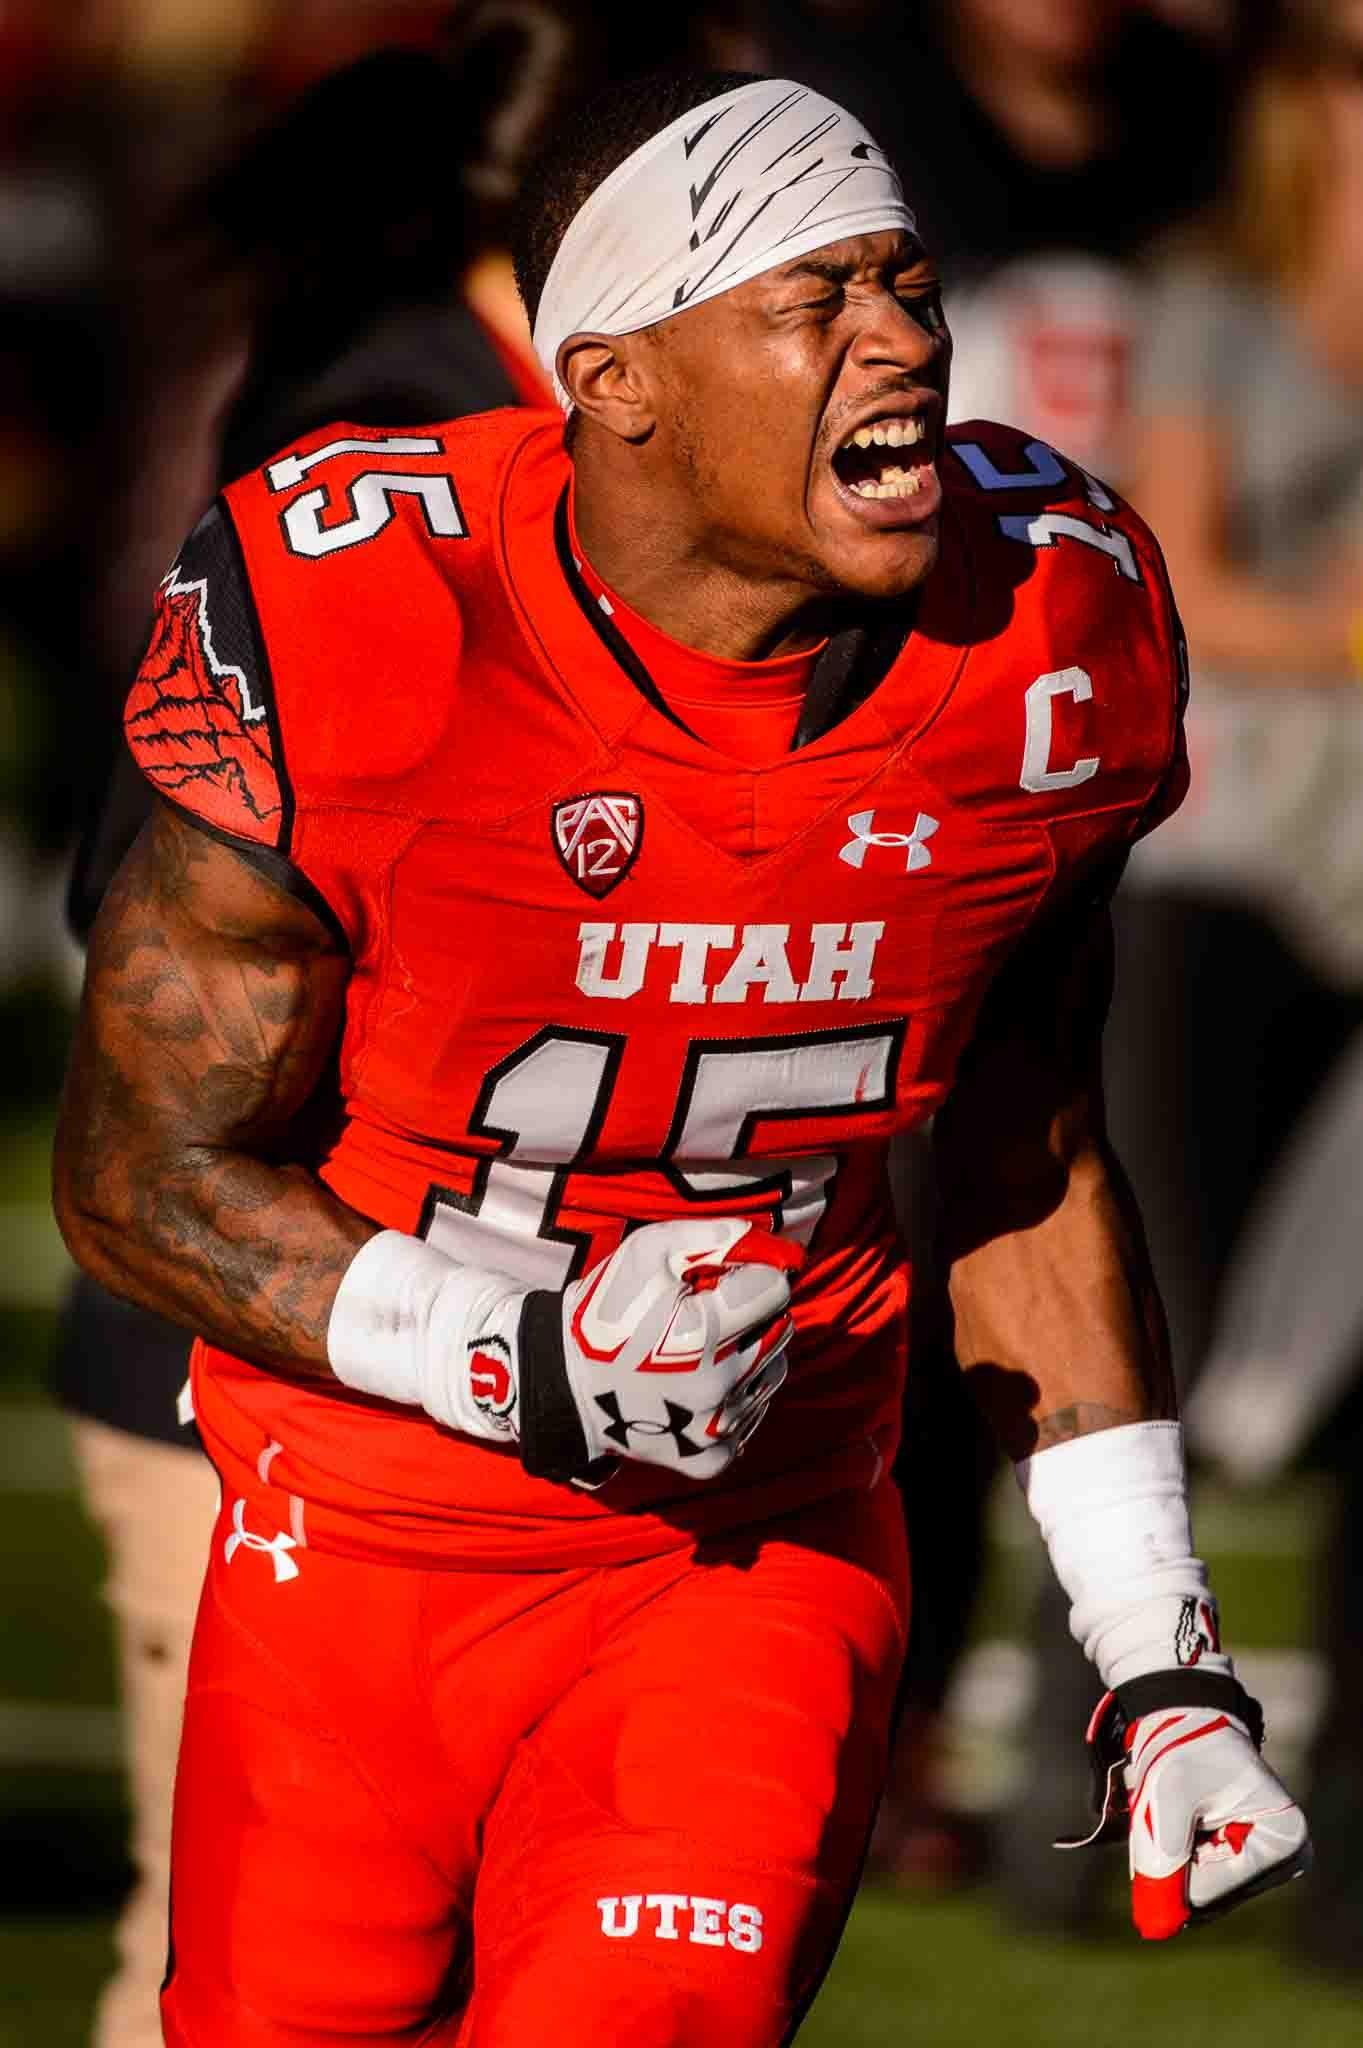 Utah Utes defensive back Dominique Hatfield (15) reacts to the loss as Utah hosts Oregon, NCAA football at Rice-Eccles Stadium in Salt Lake City